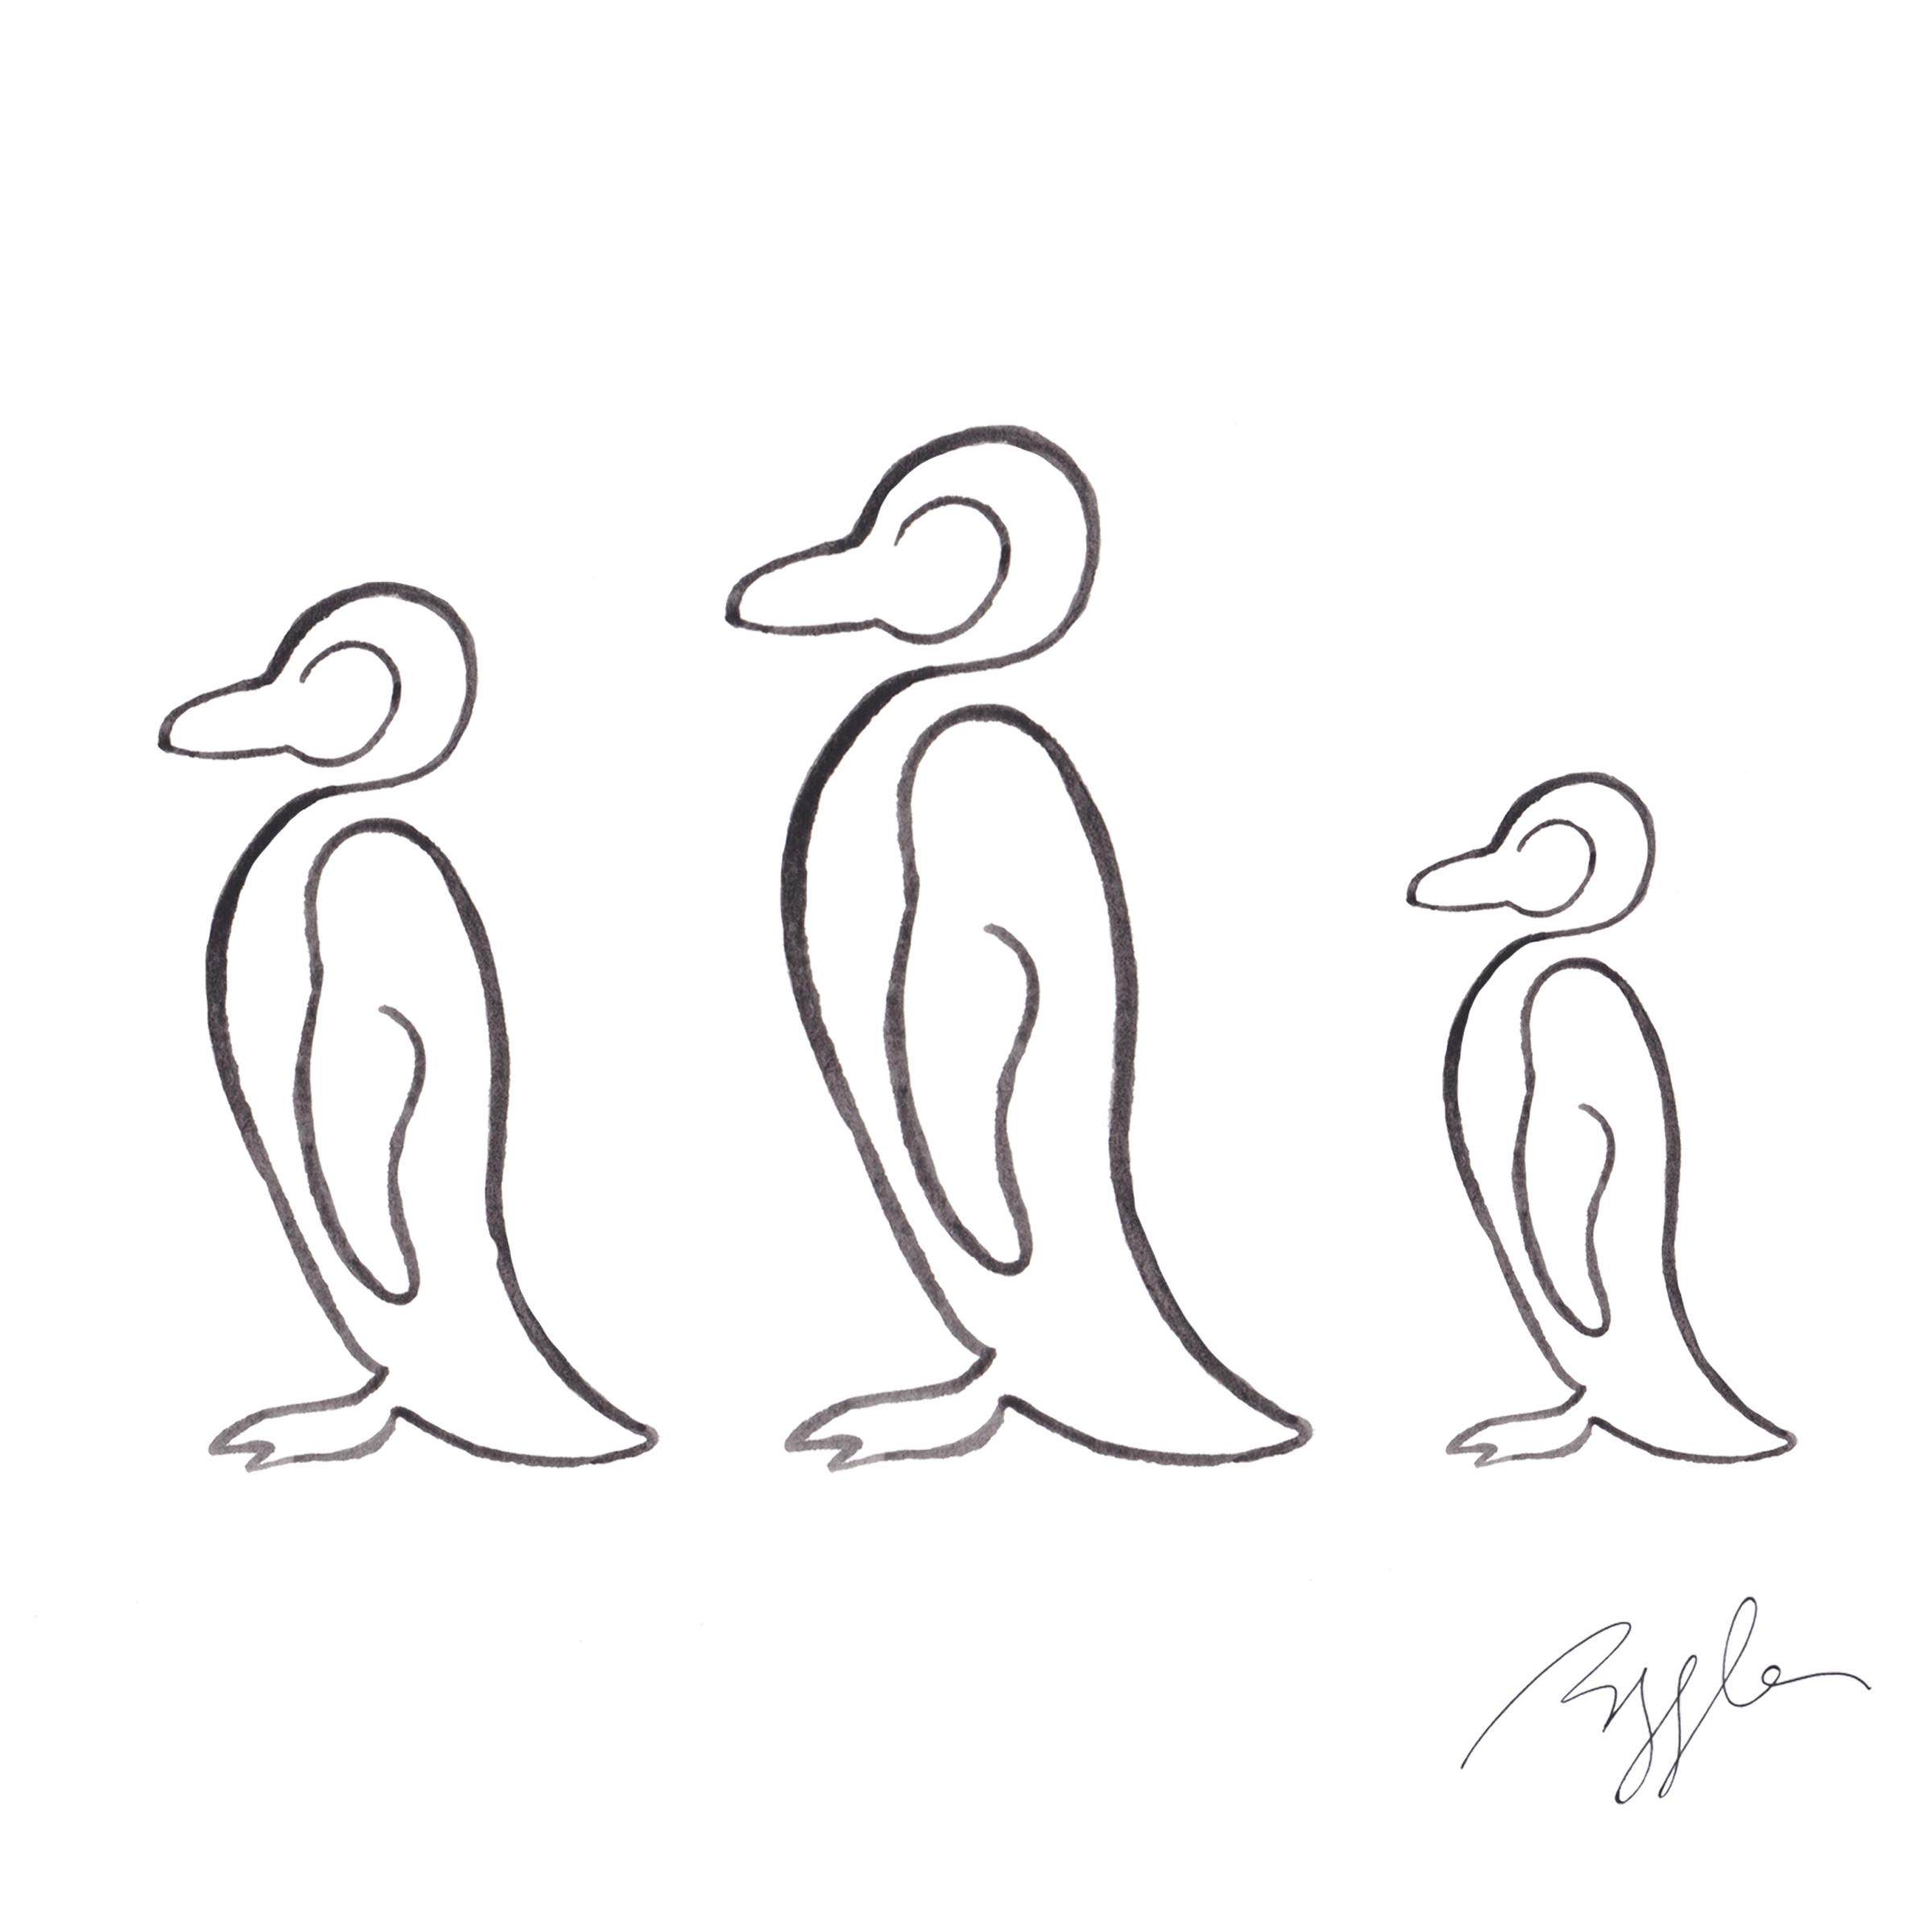 Brazzlebird - Penguin Line Art